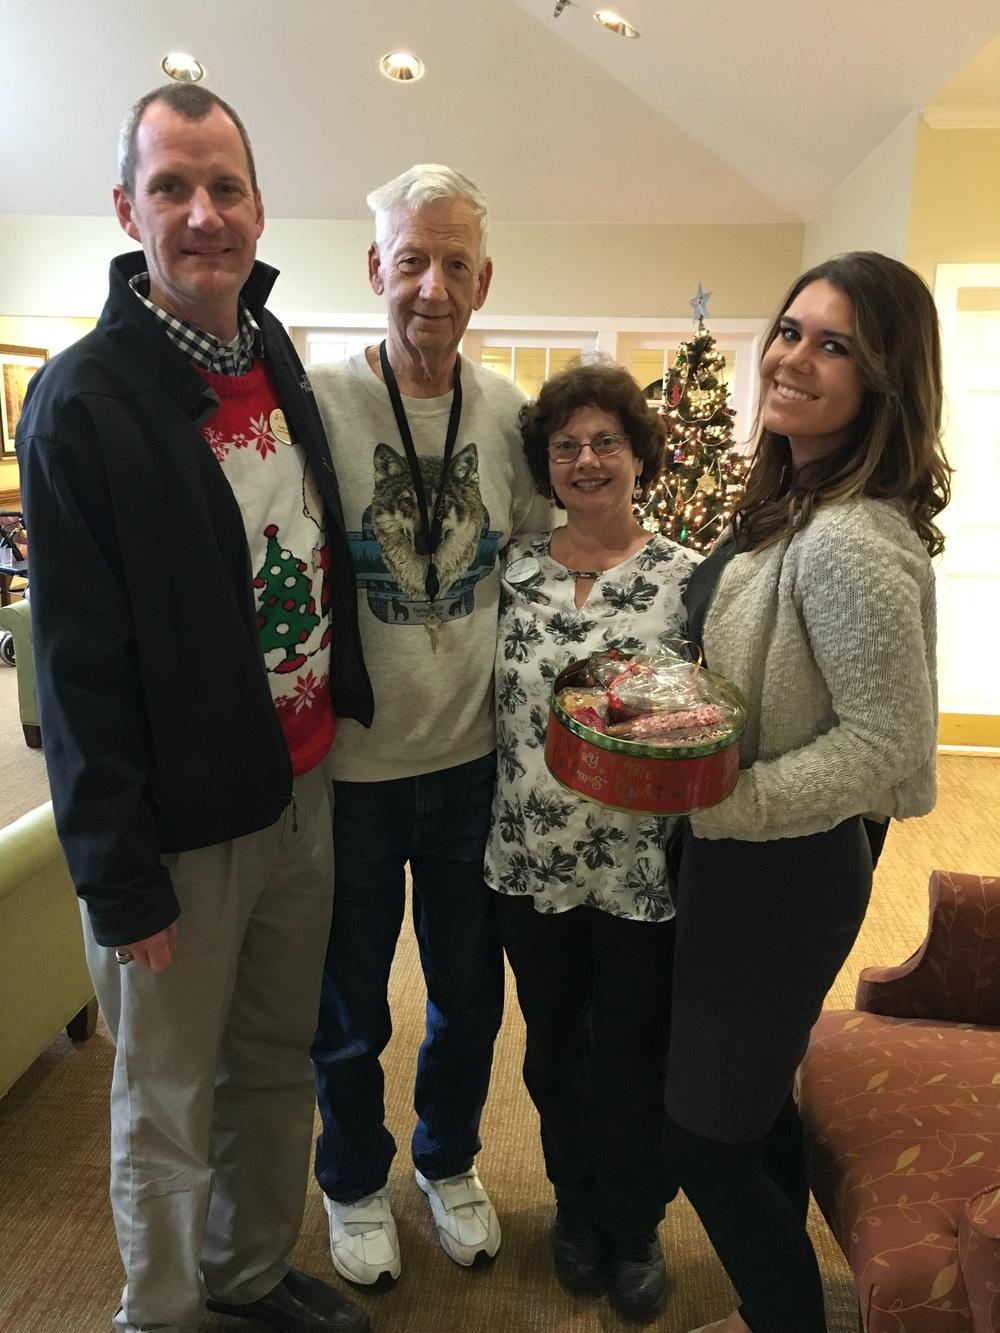 Lance, Dennis and Mary, Brookdale Senior Living Solutions & Emily Graham, Quantam Solutions